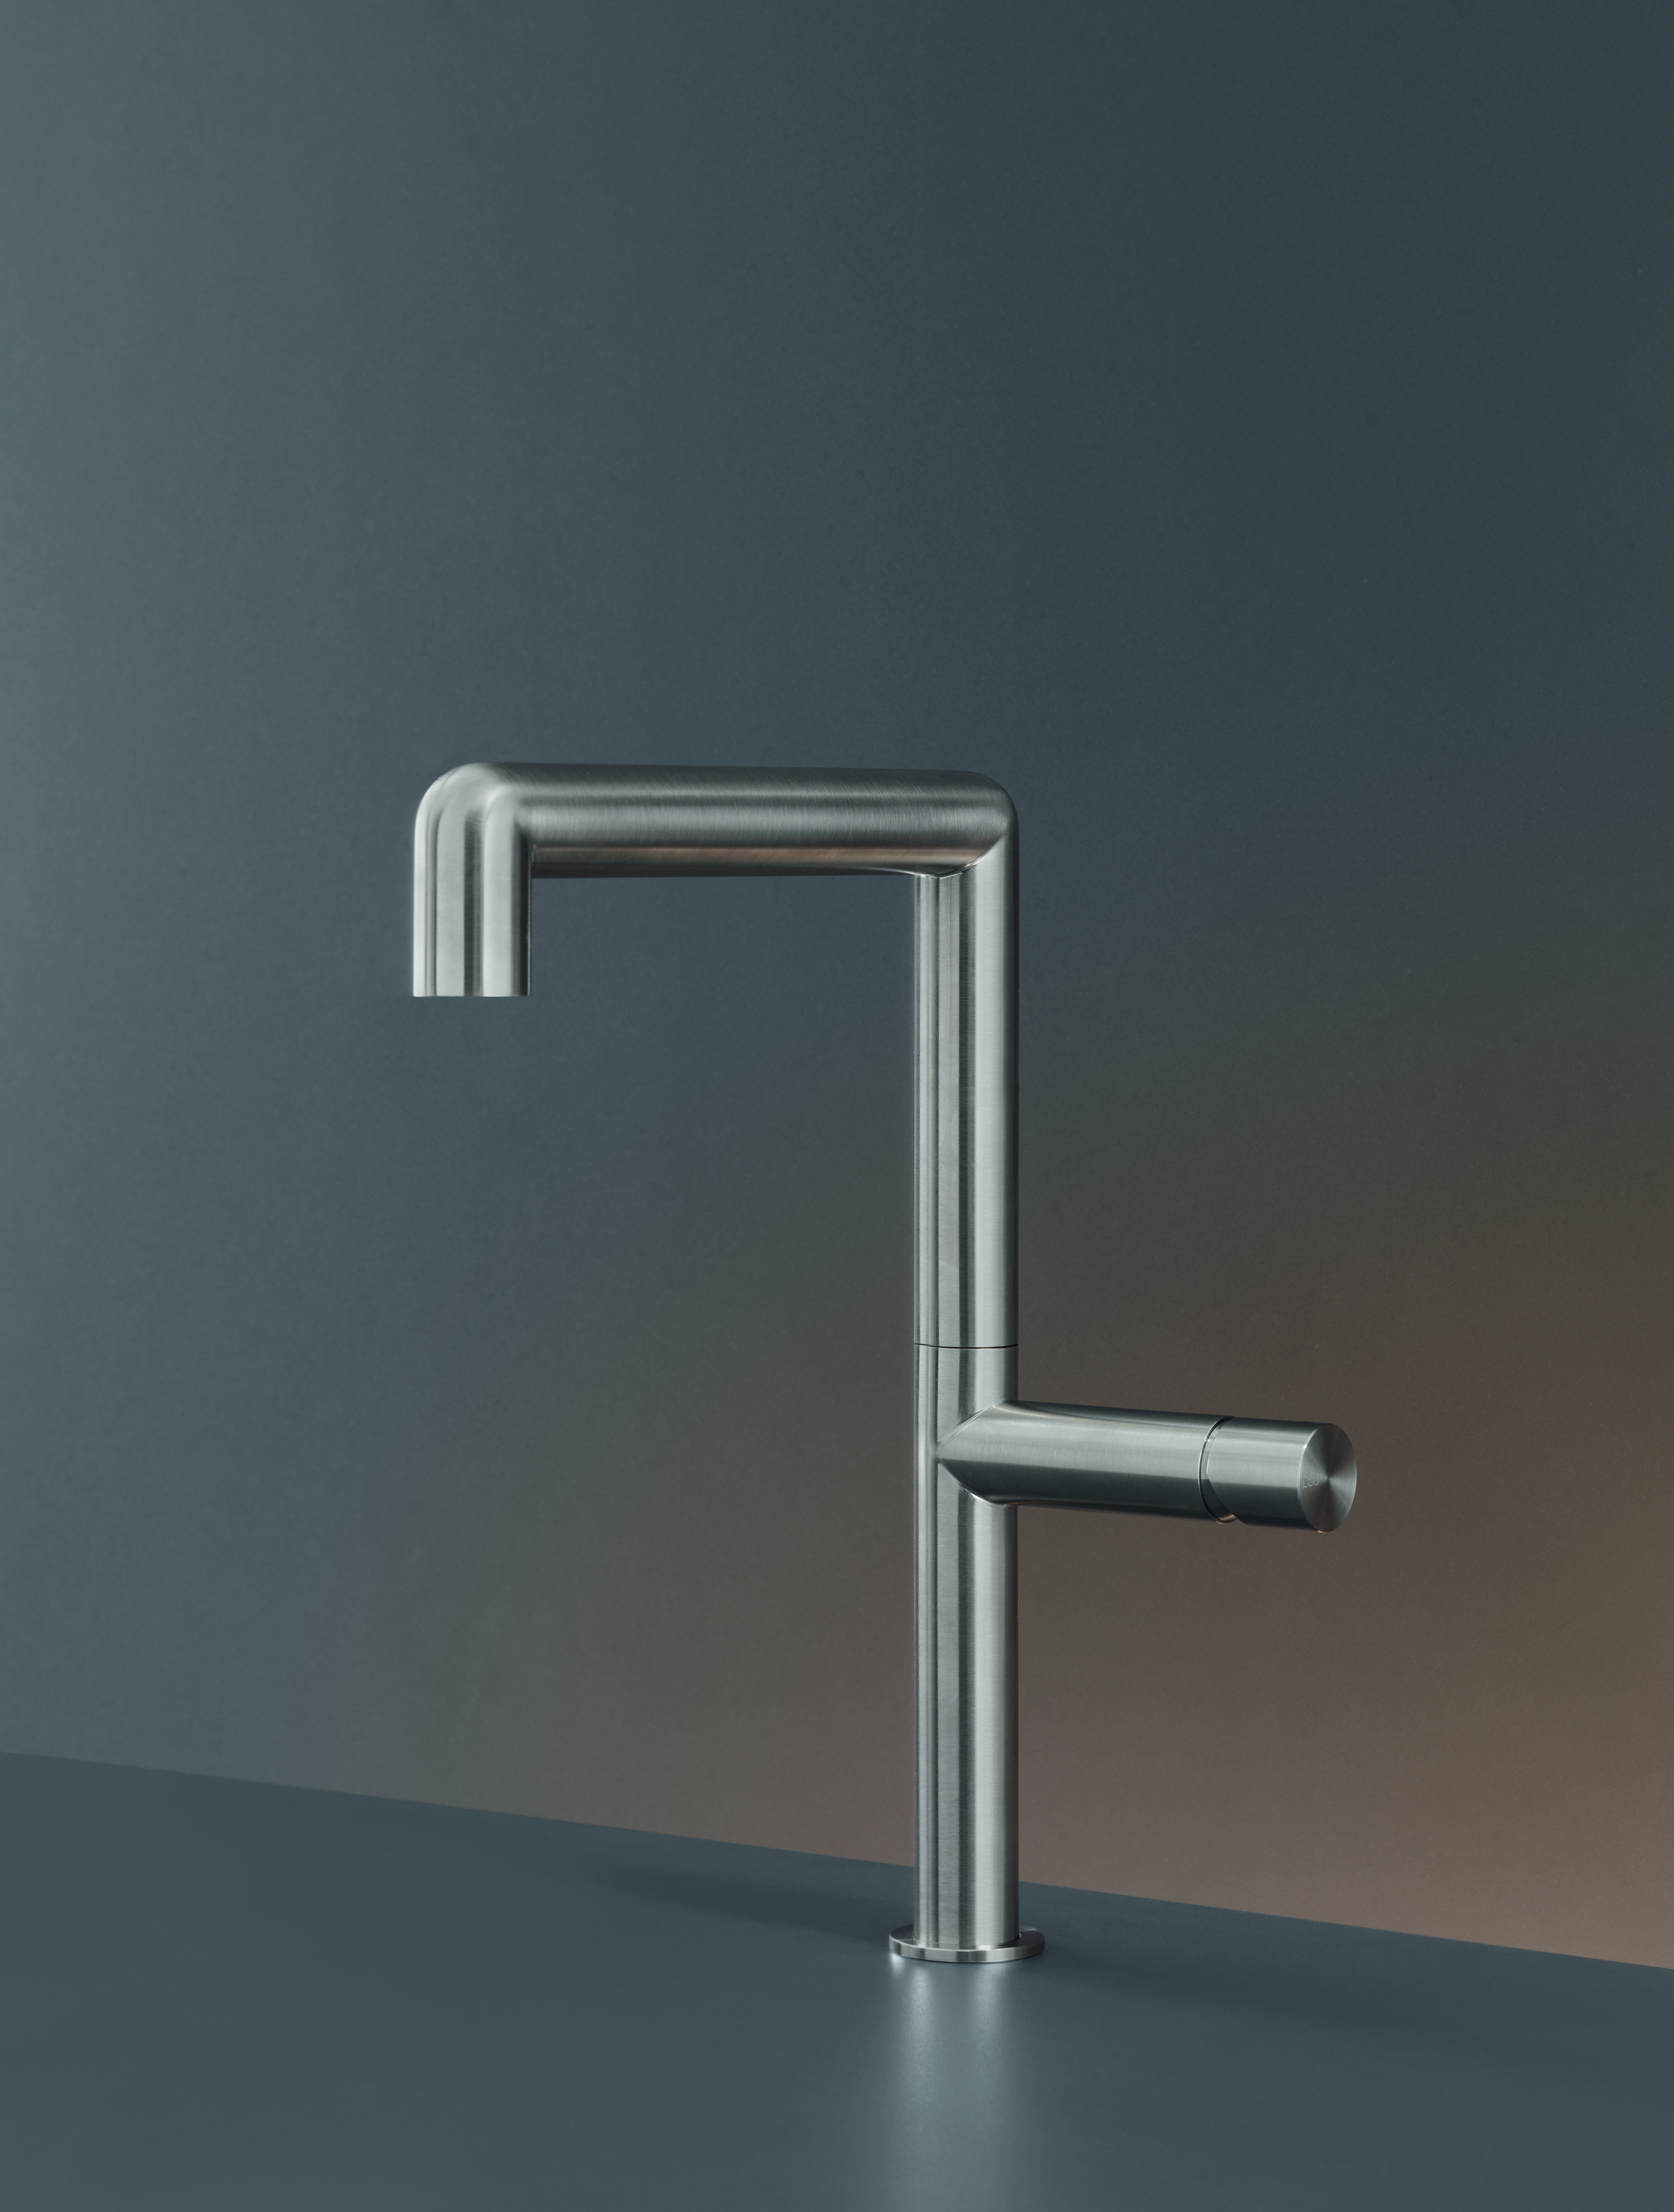 Modern Cartesio Deck Mount Faucet